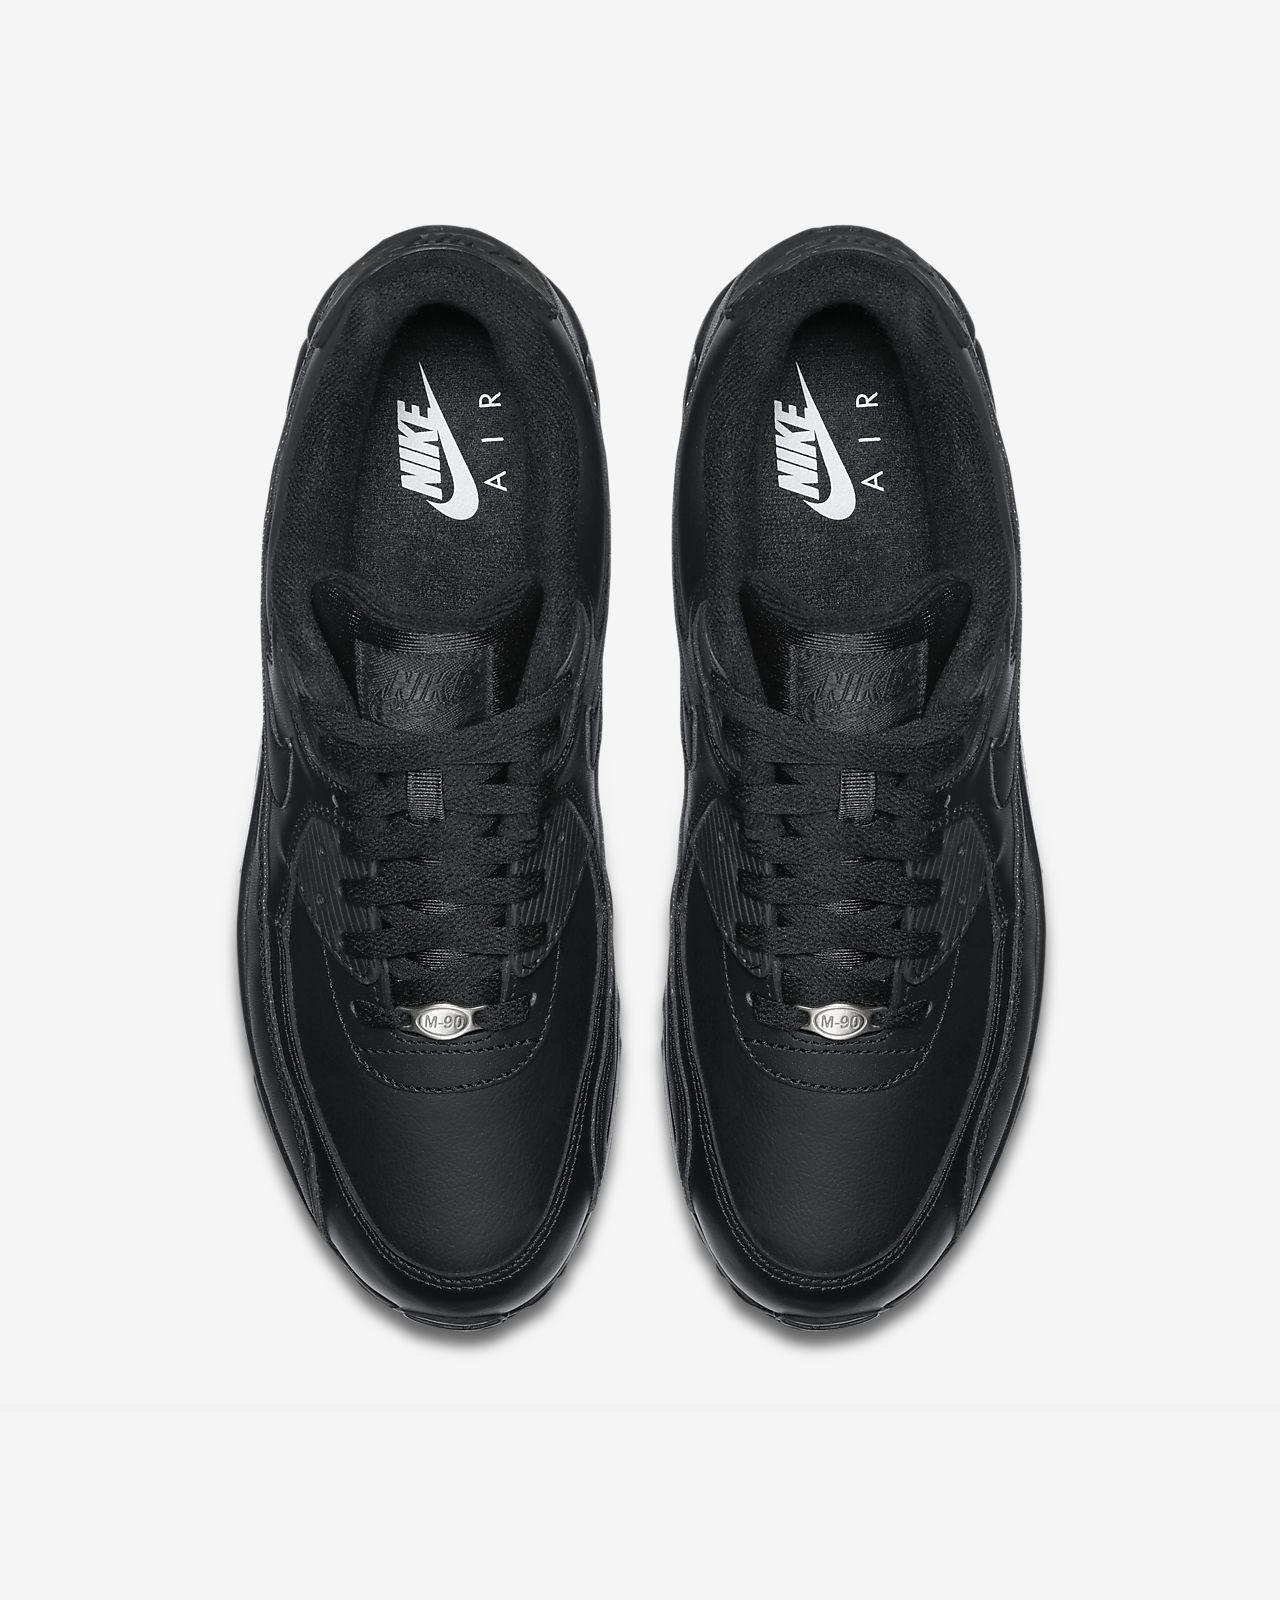 quality design a1b92 6cac5 ... Scarpa Nike Air Max 90 Leather - Uomo